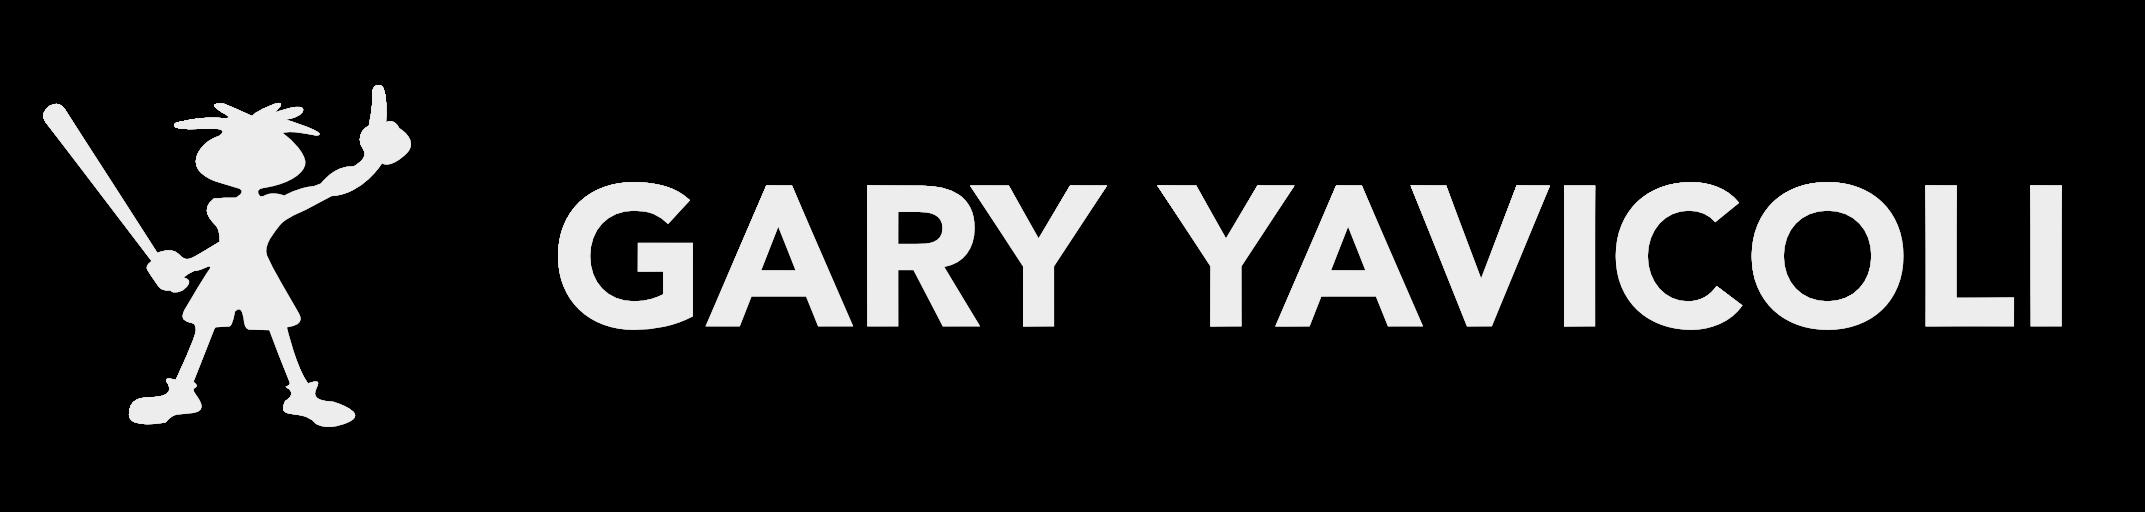 Gary Yavicoli